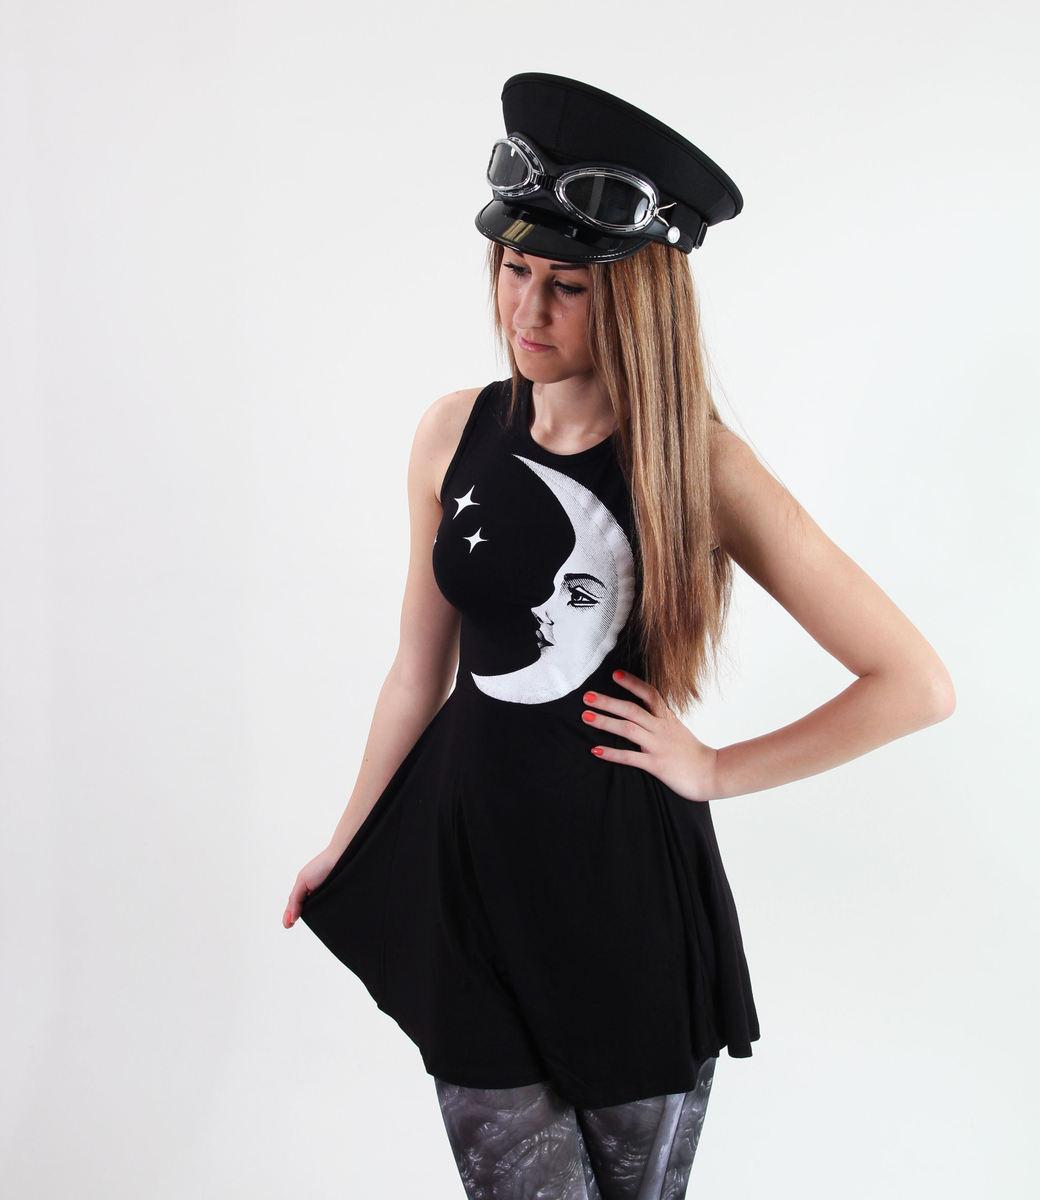 šaty dámské KILLSTAR - Moonchild - Black - KIL231 L